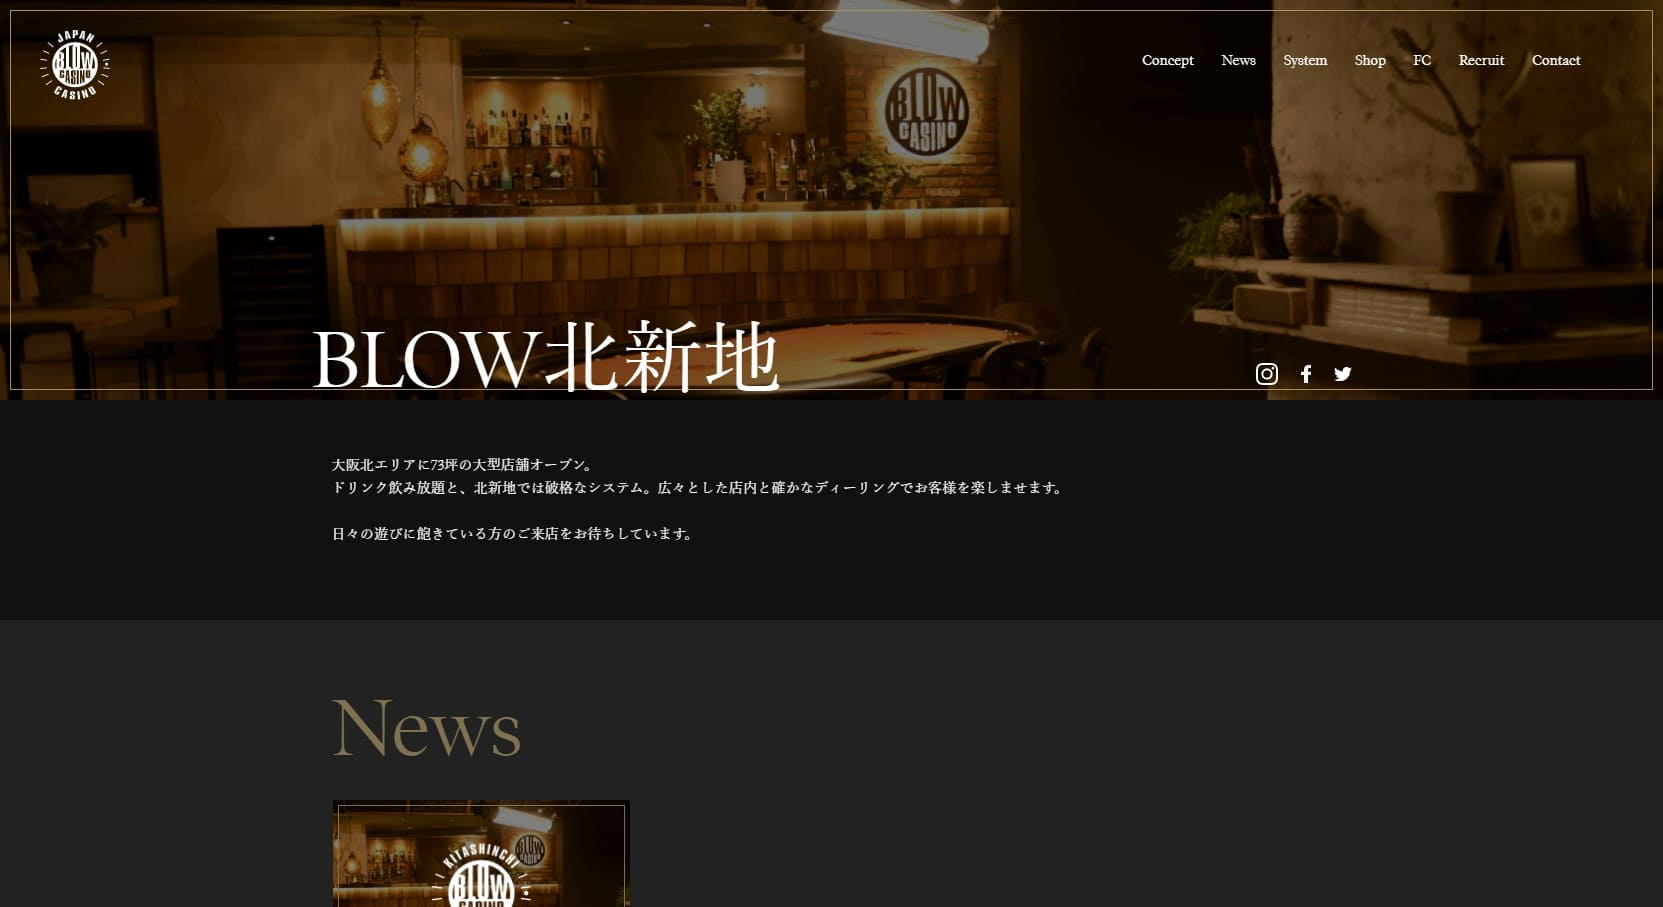 BLOW CASINO北新地のウェブサイト画像。